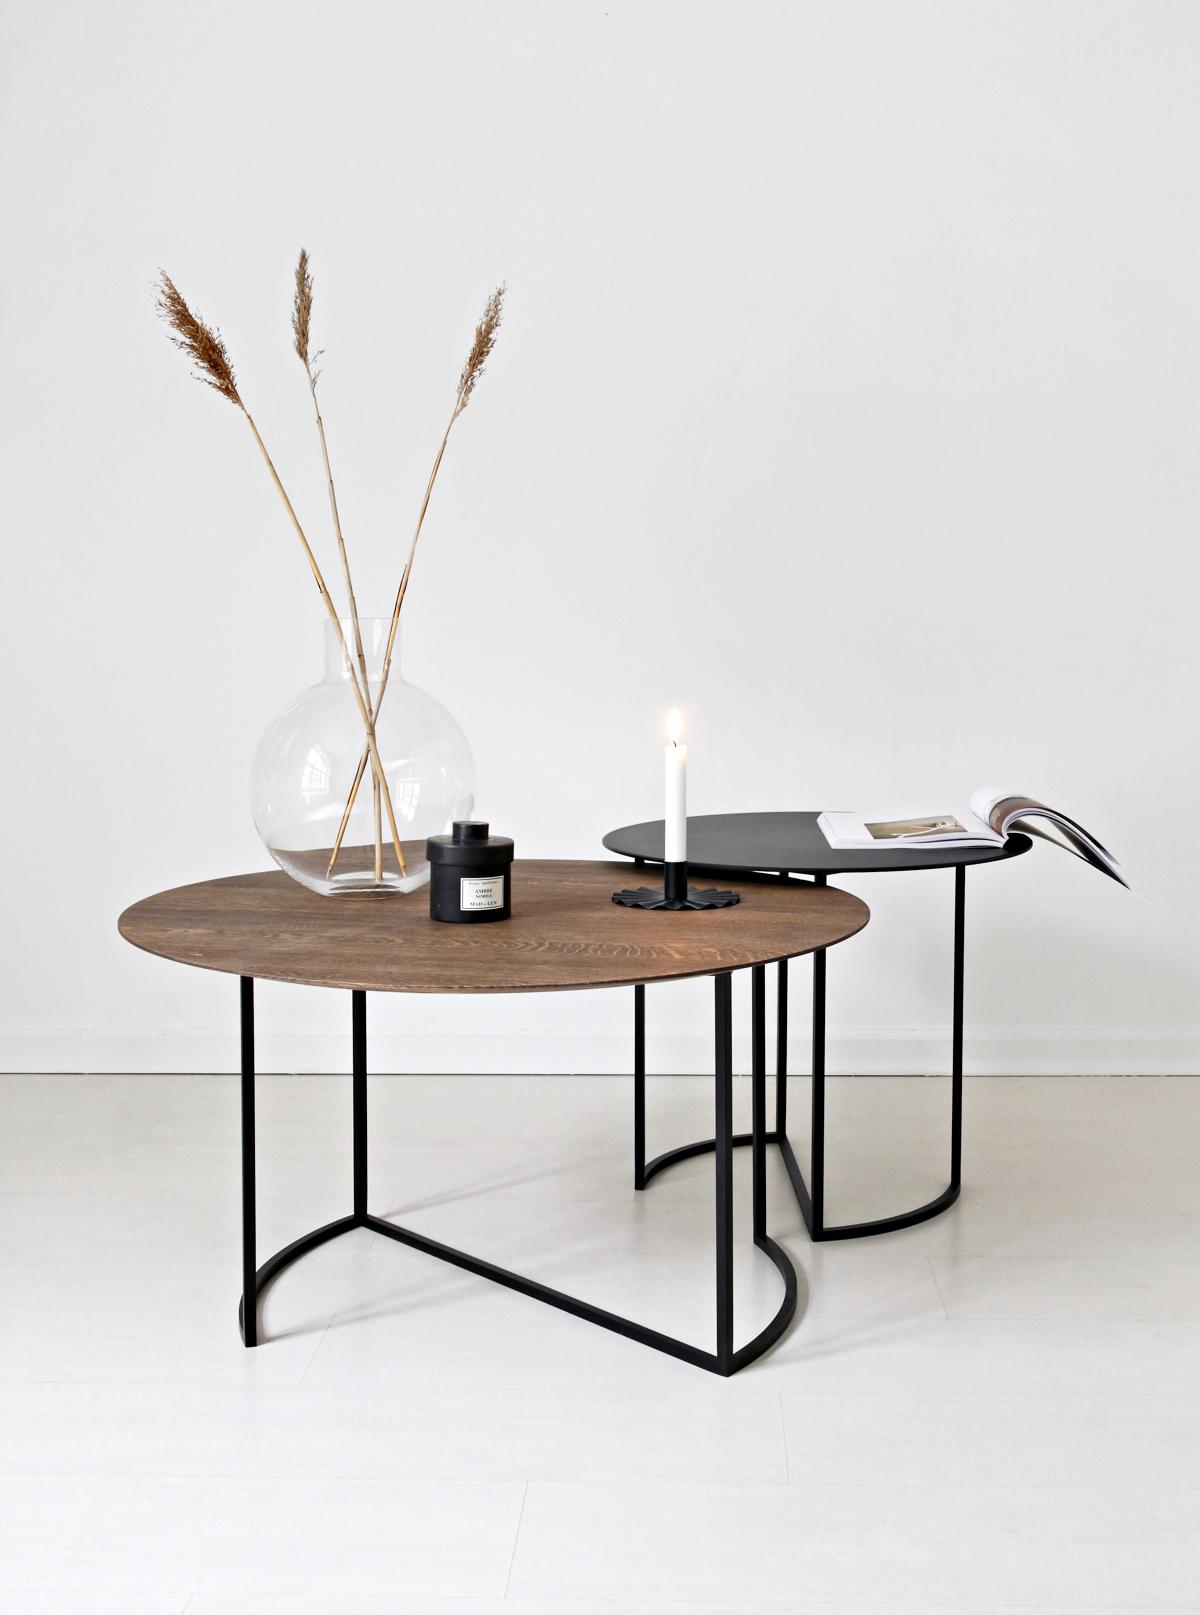 2K2H_Ljå_coffeetable-sofabord-01